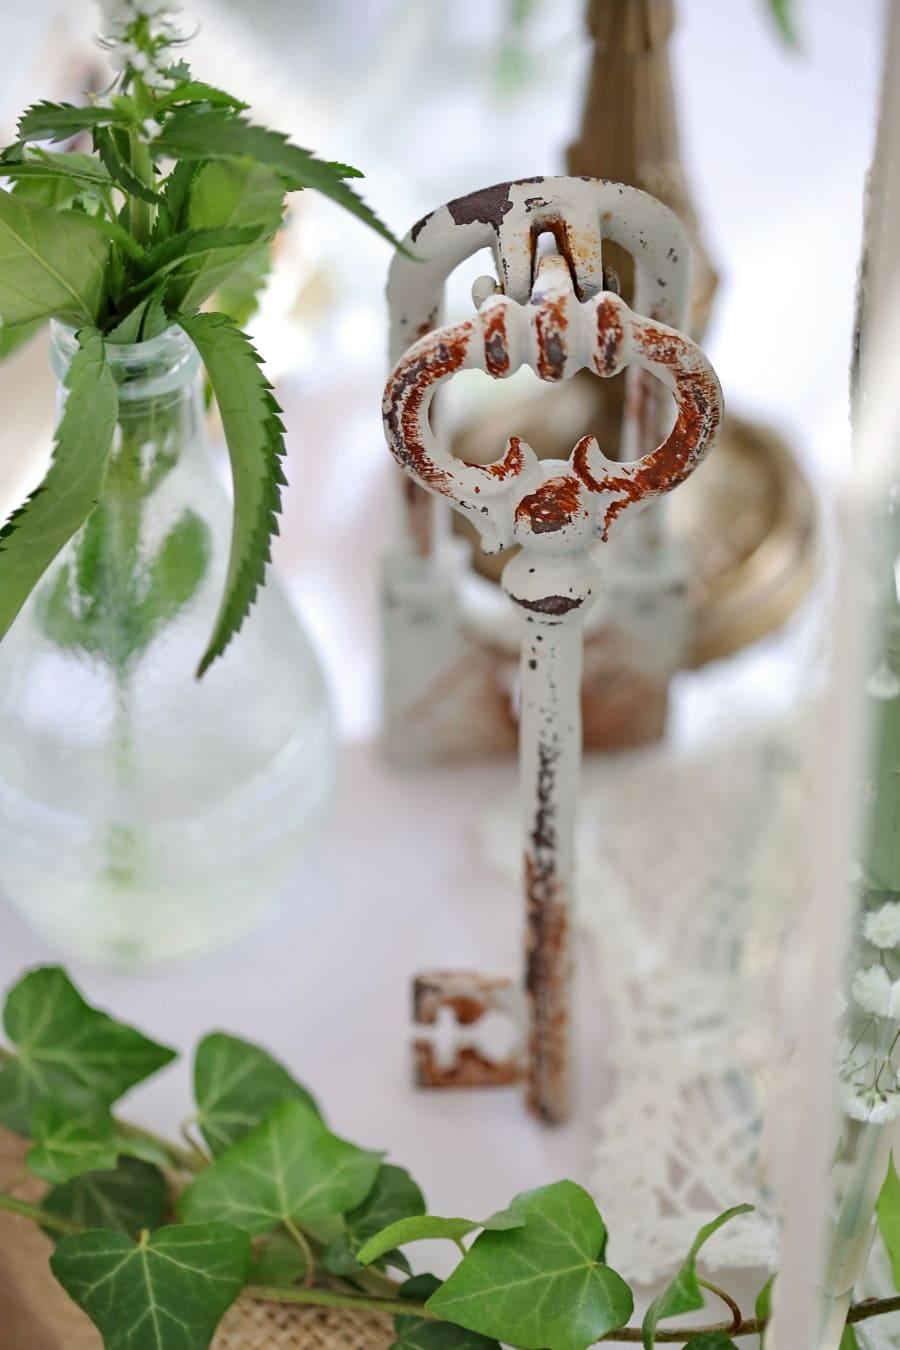 key, metal key, old, old fashioned, rust, metal, old style, leaf, decoration, still life